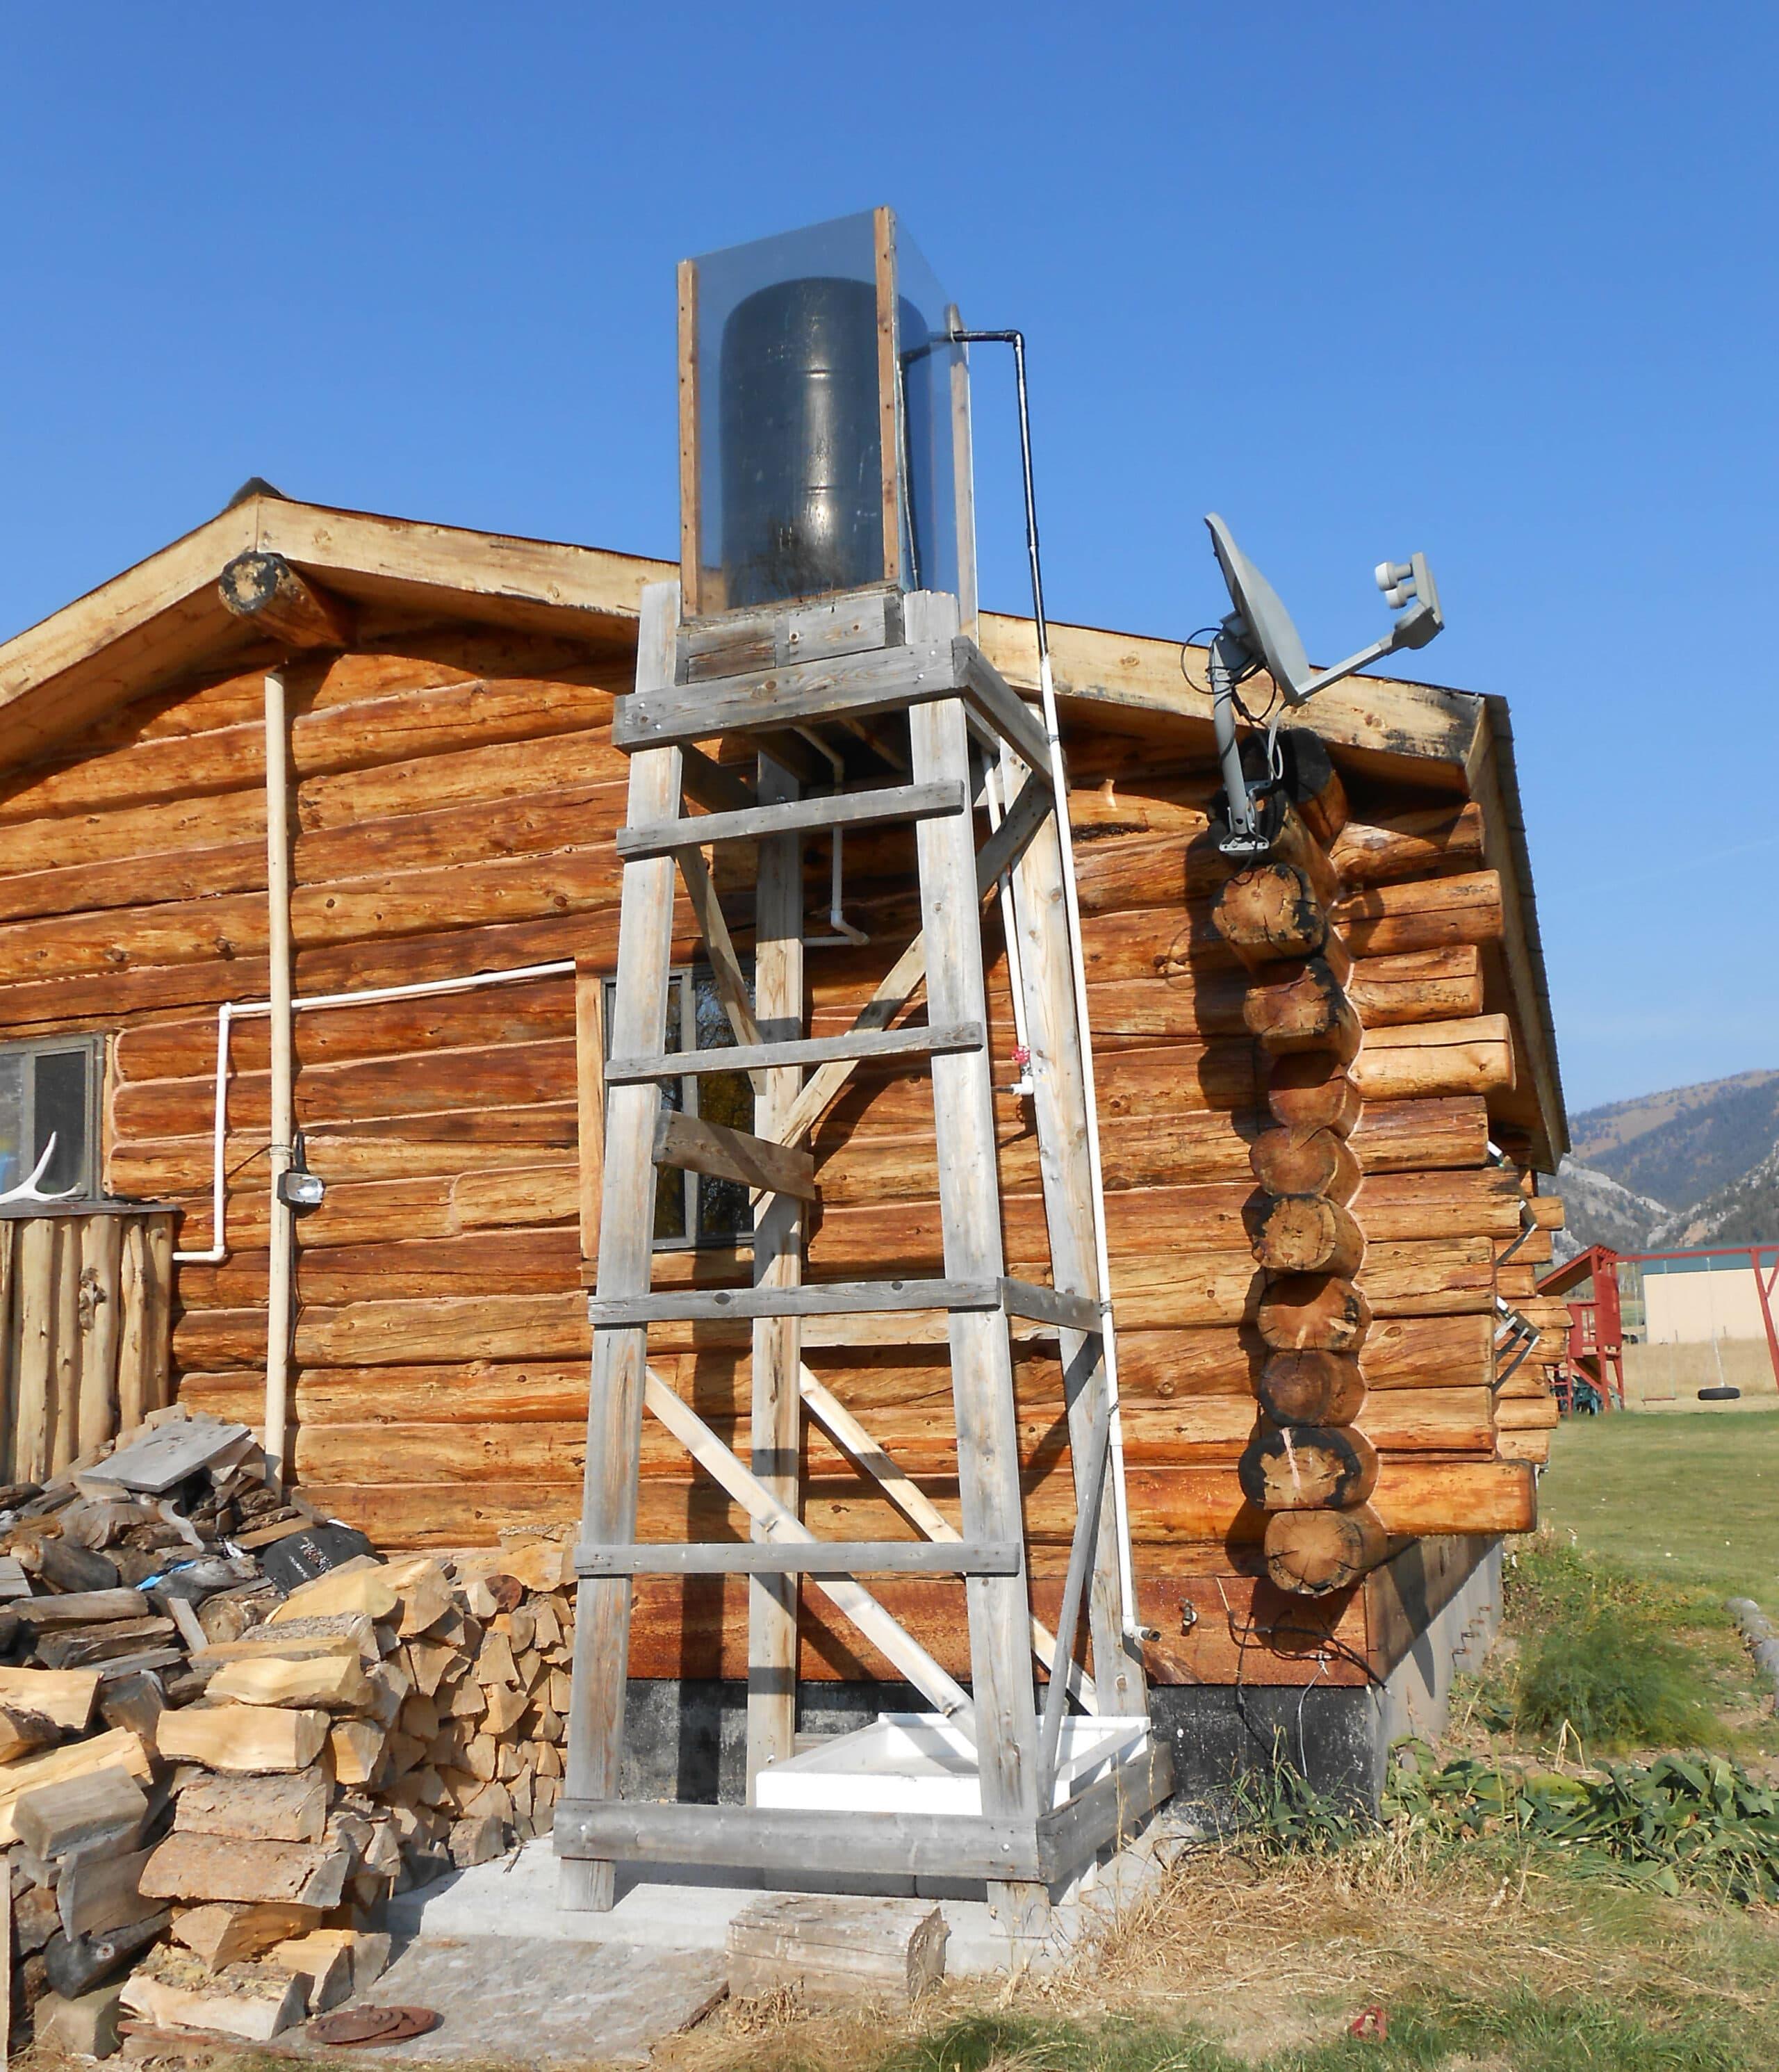 A Solar Shower Preparedness AdvicePreparedness Advice